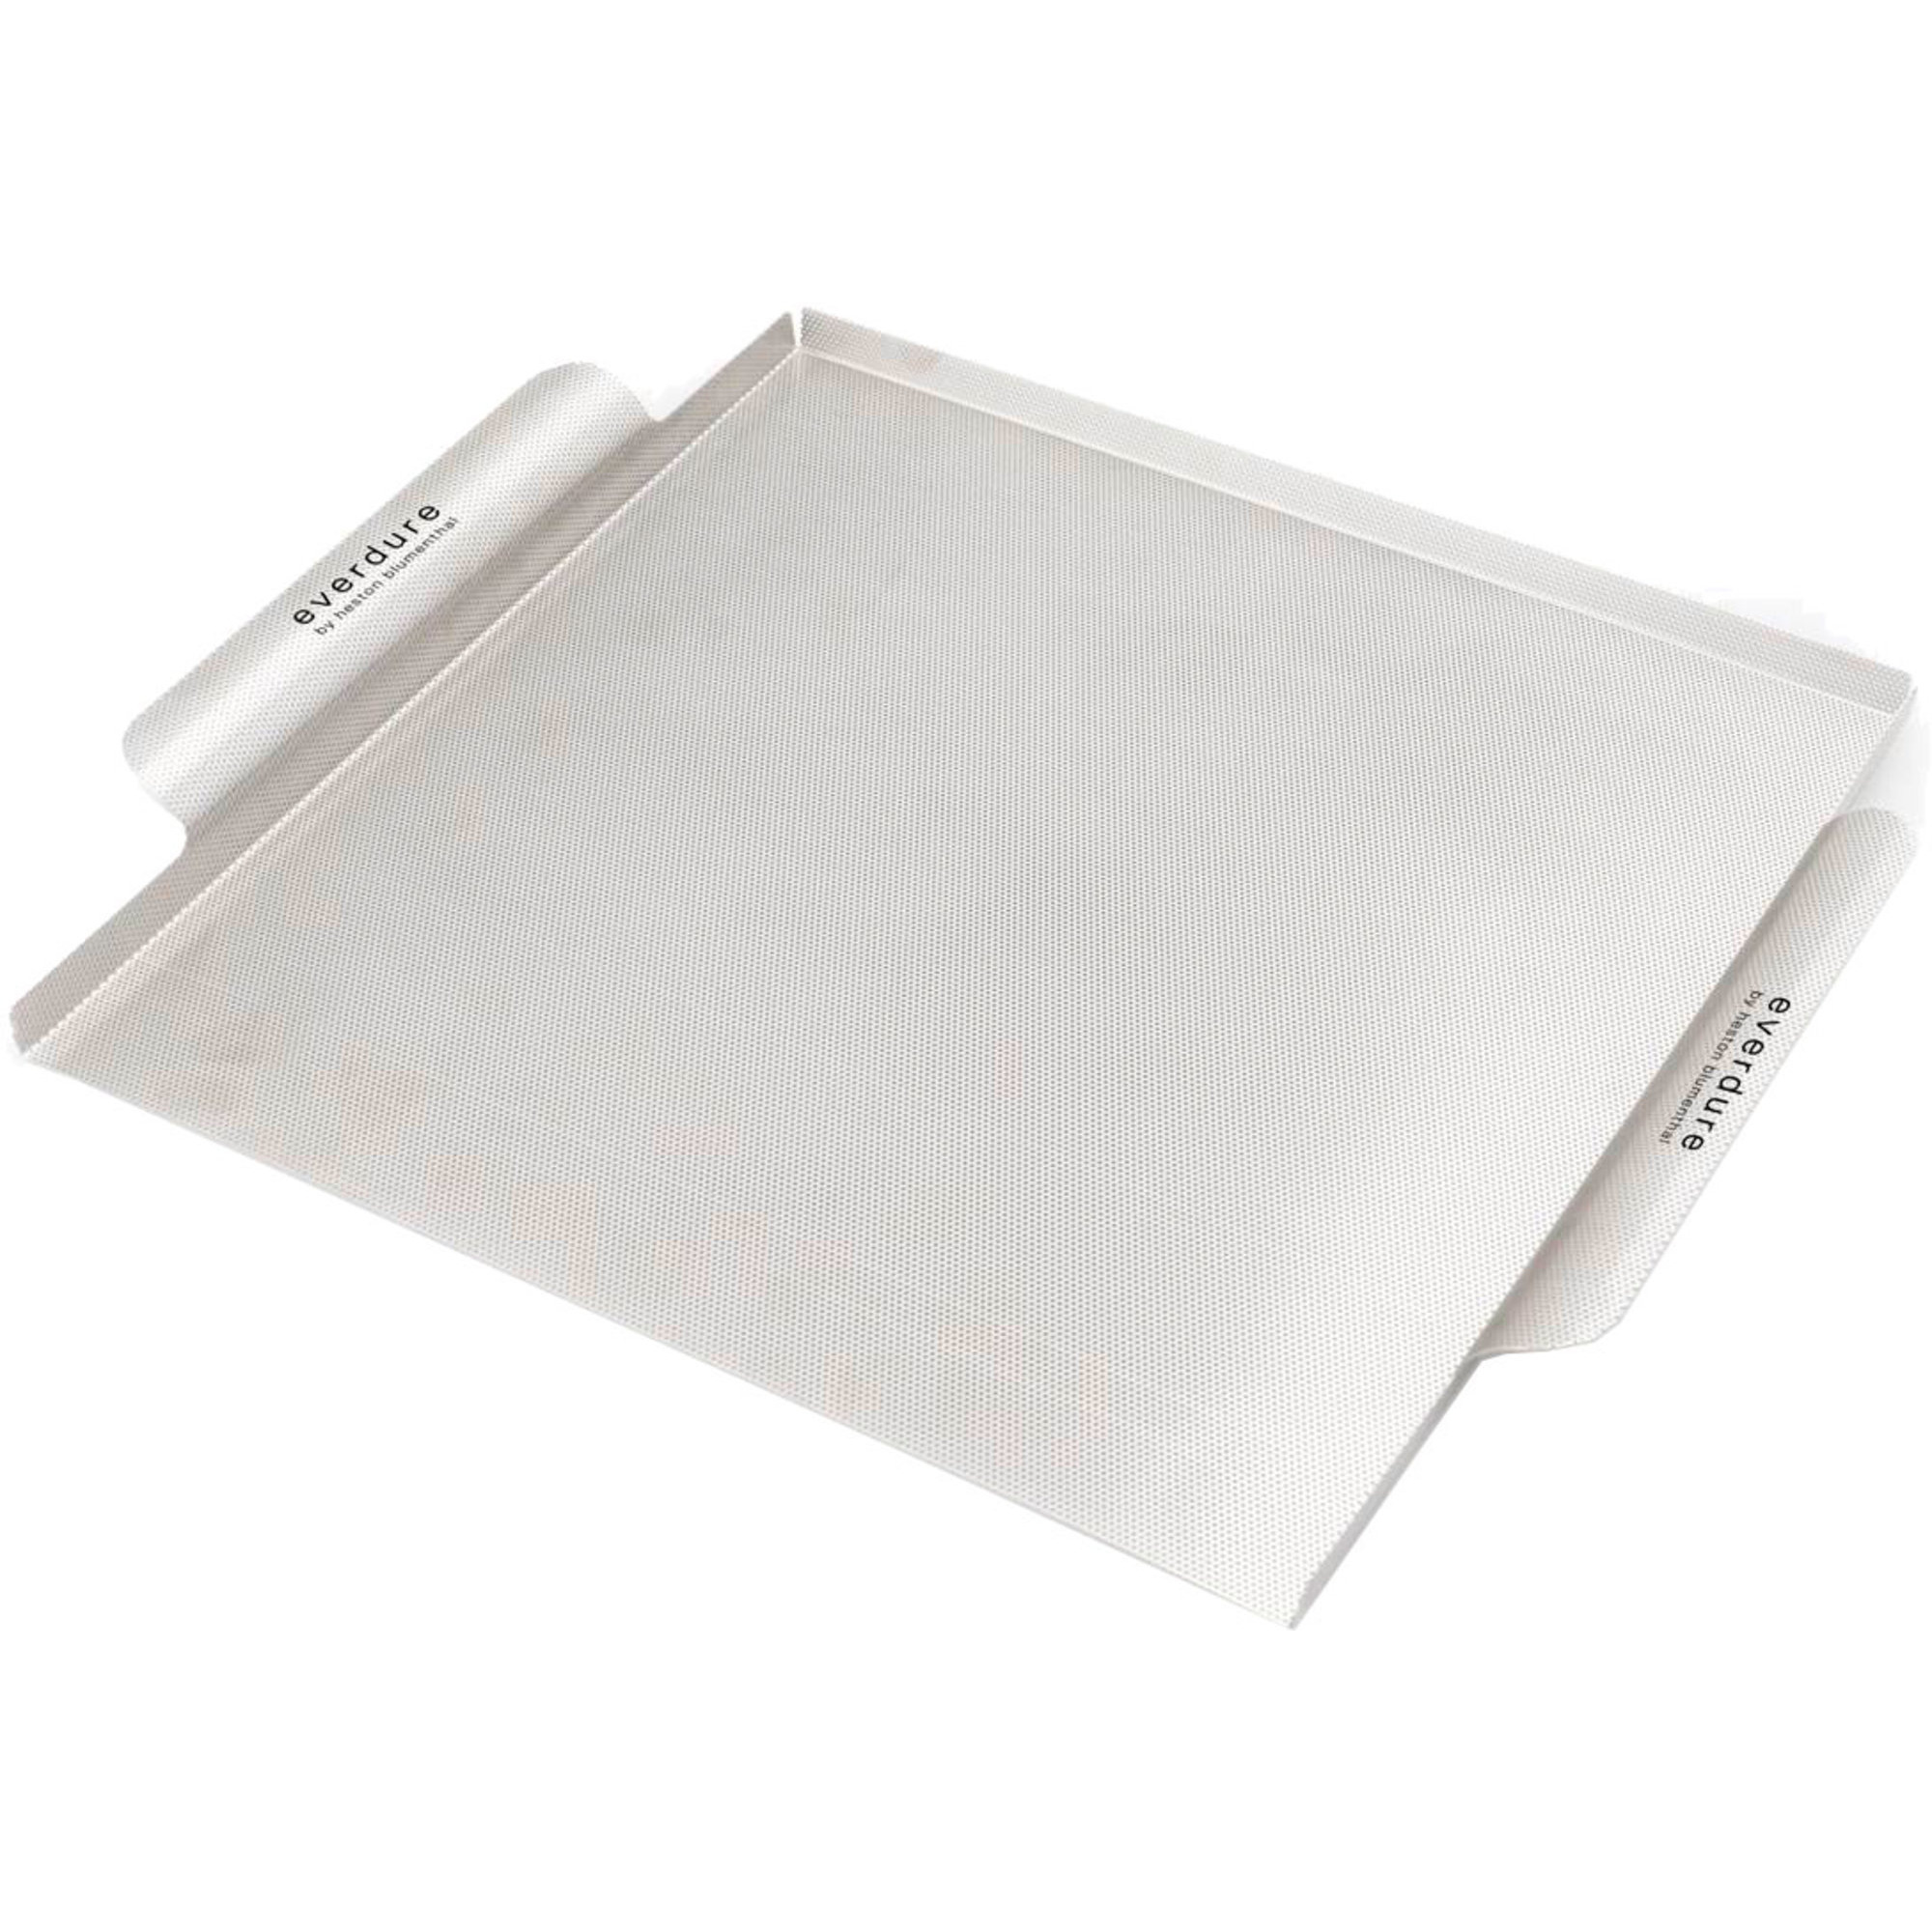 Everdure T-Micro-hole flat plate